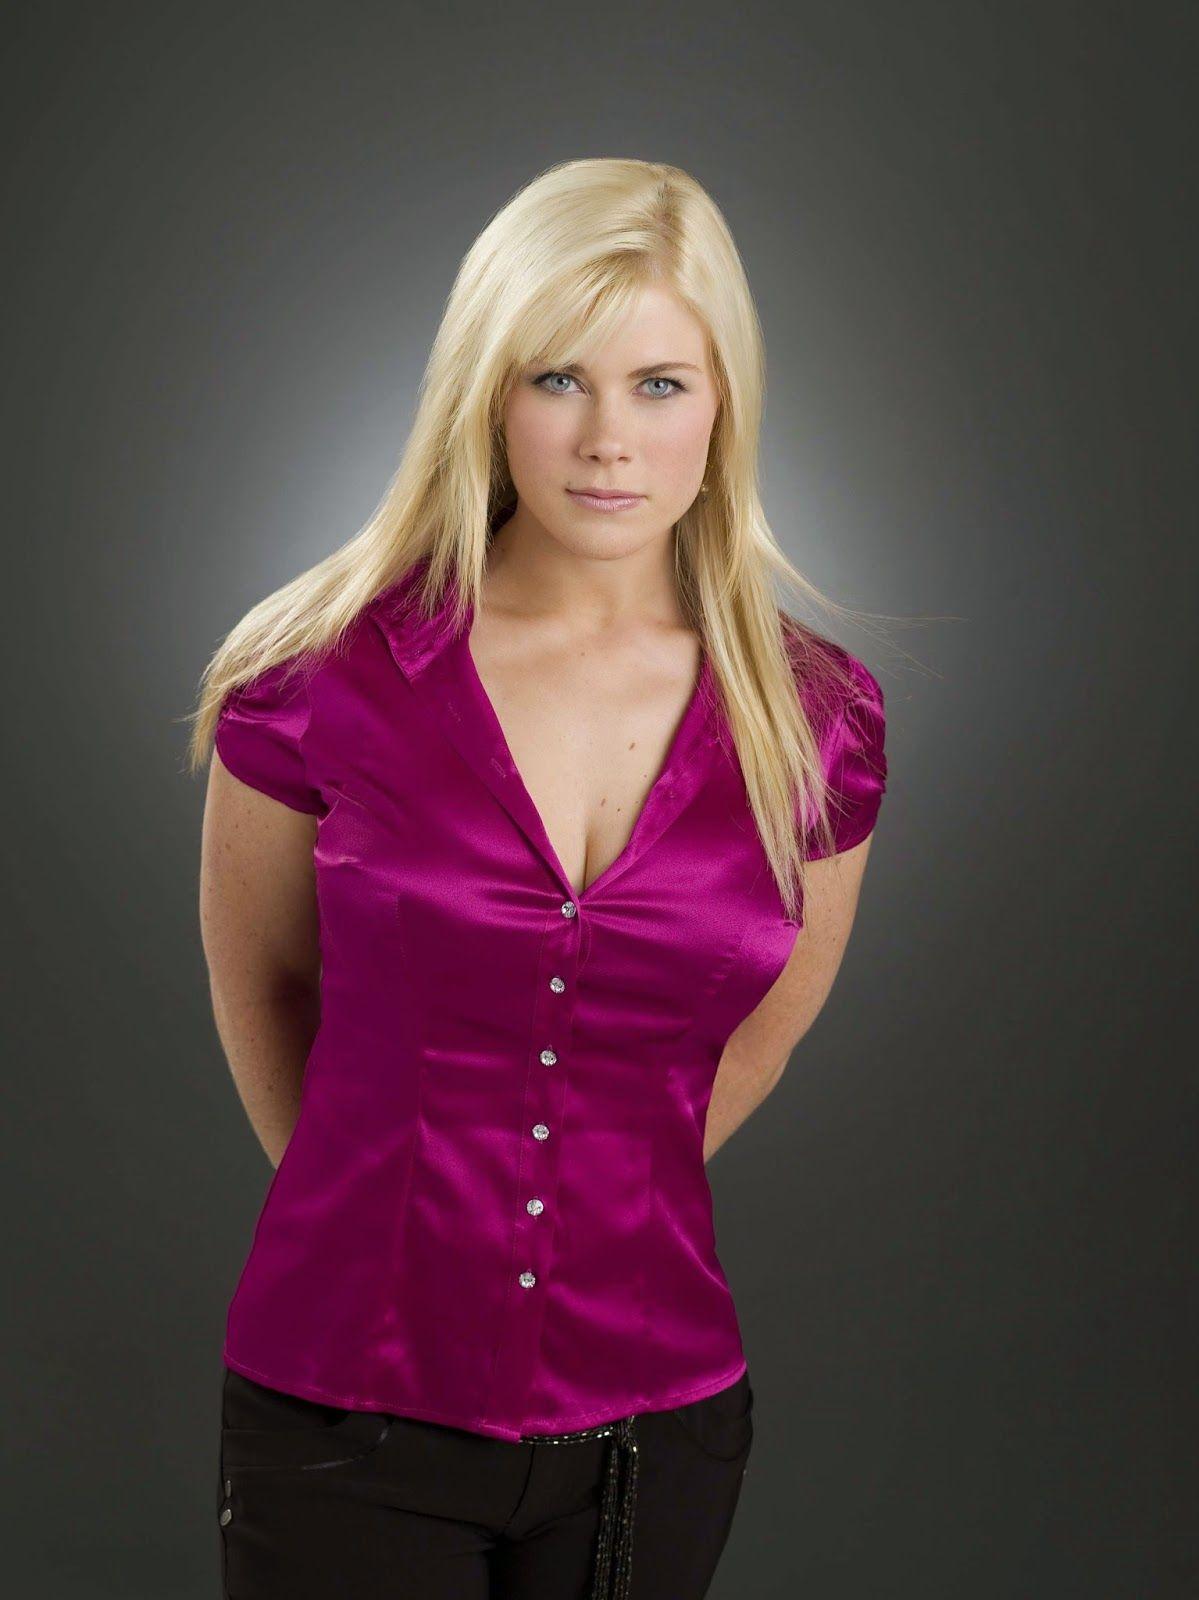 Alison Sweeney Nude pink satin blouse   satin blouses, satin shirt, pink satin